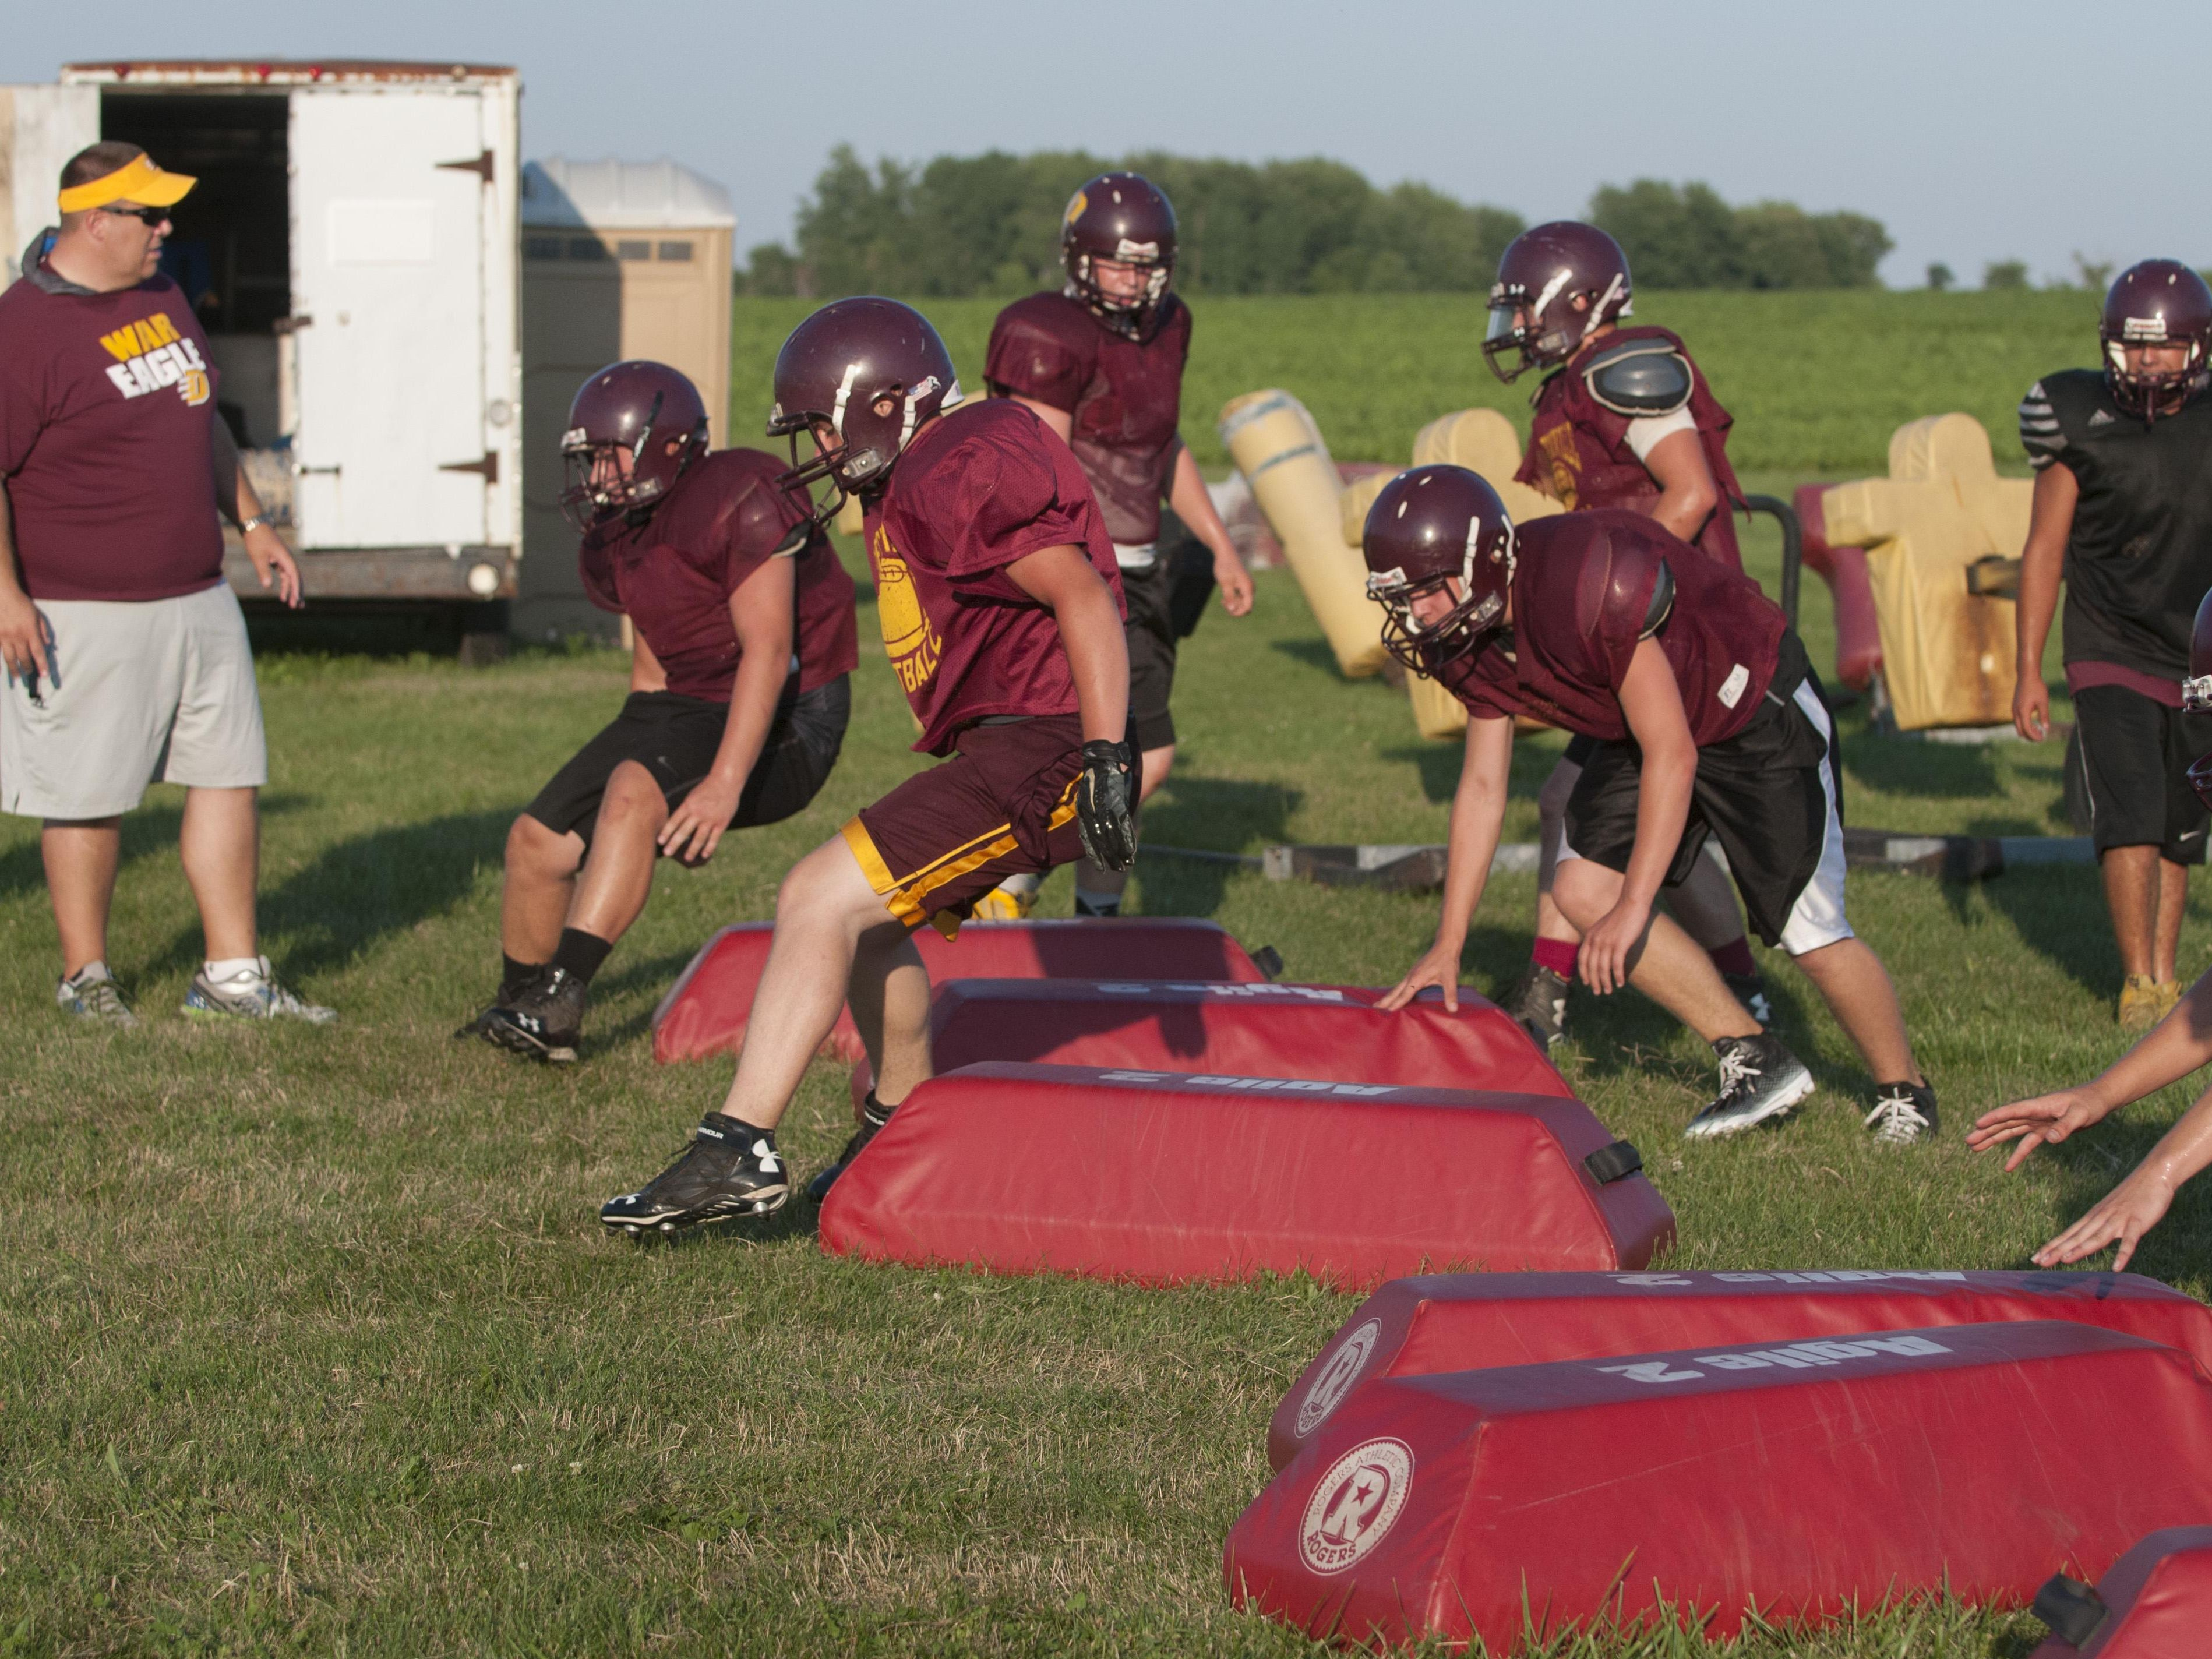 Deckerville's players run through drills Wednesday, Aug. 10, 2016 at Deckerville High School.